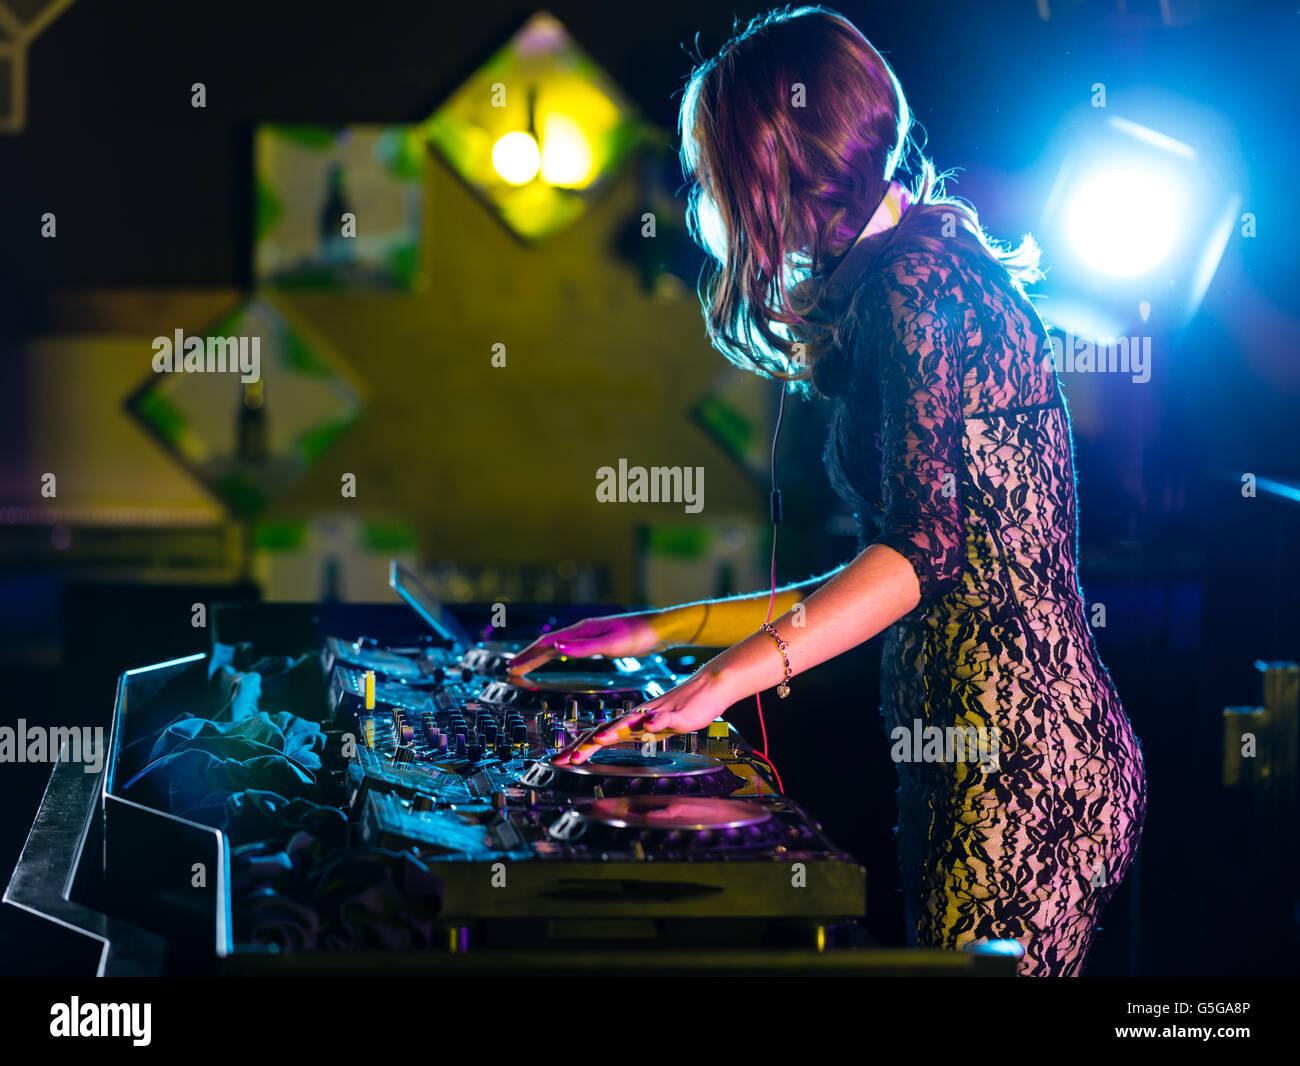 Disc jockey brunette girl mixing electronic music in club - Stock Image